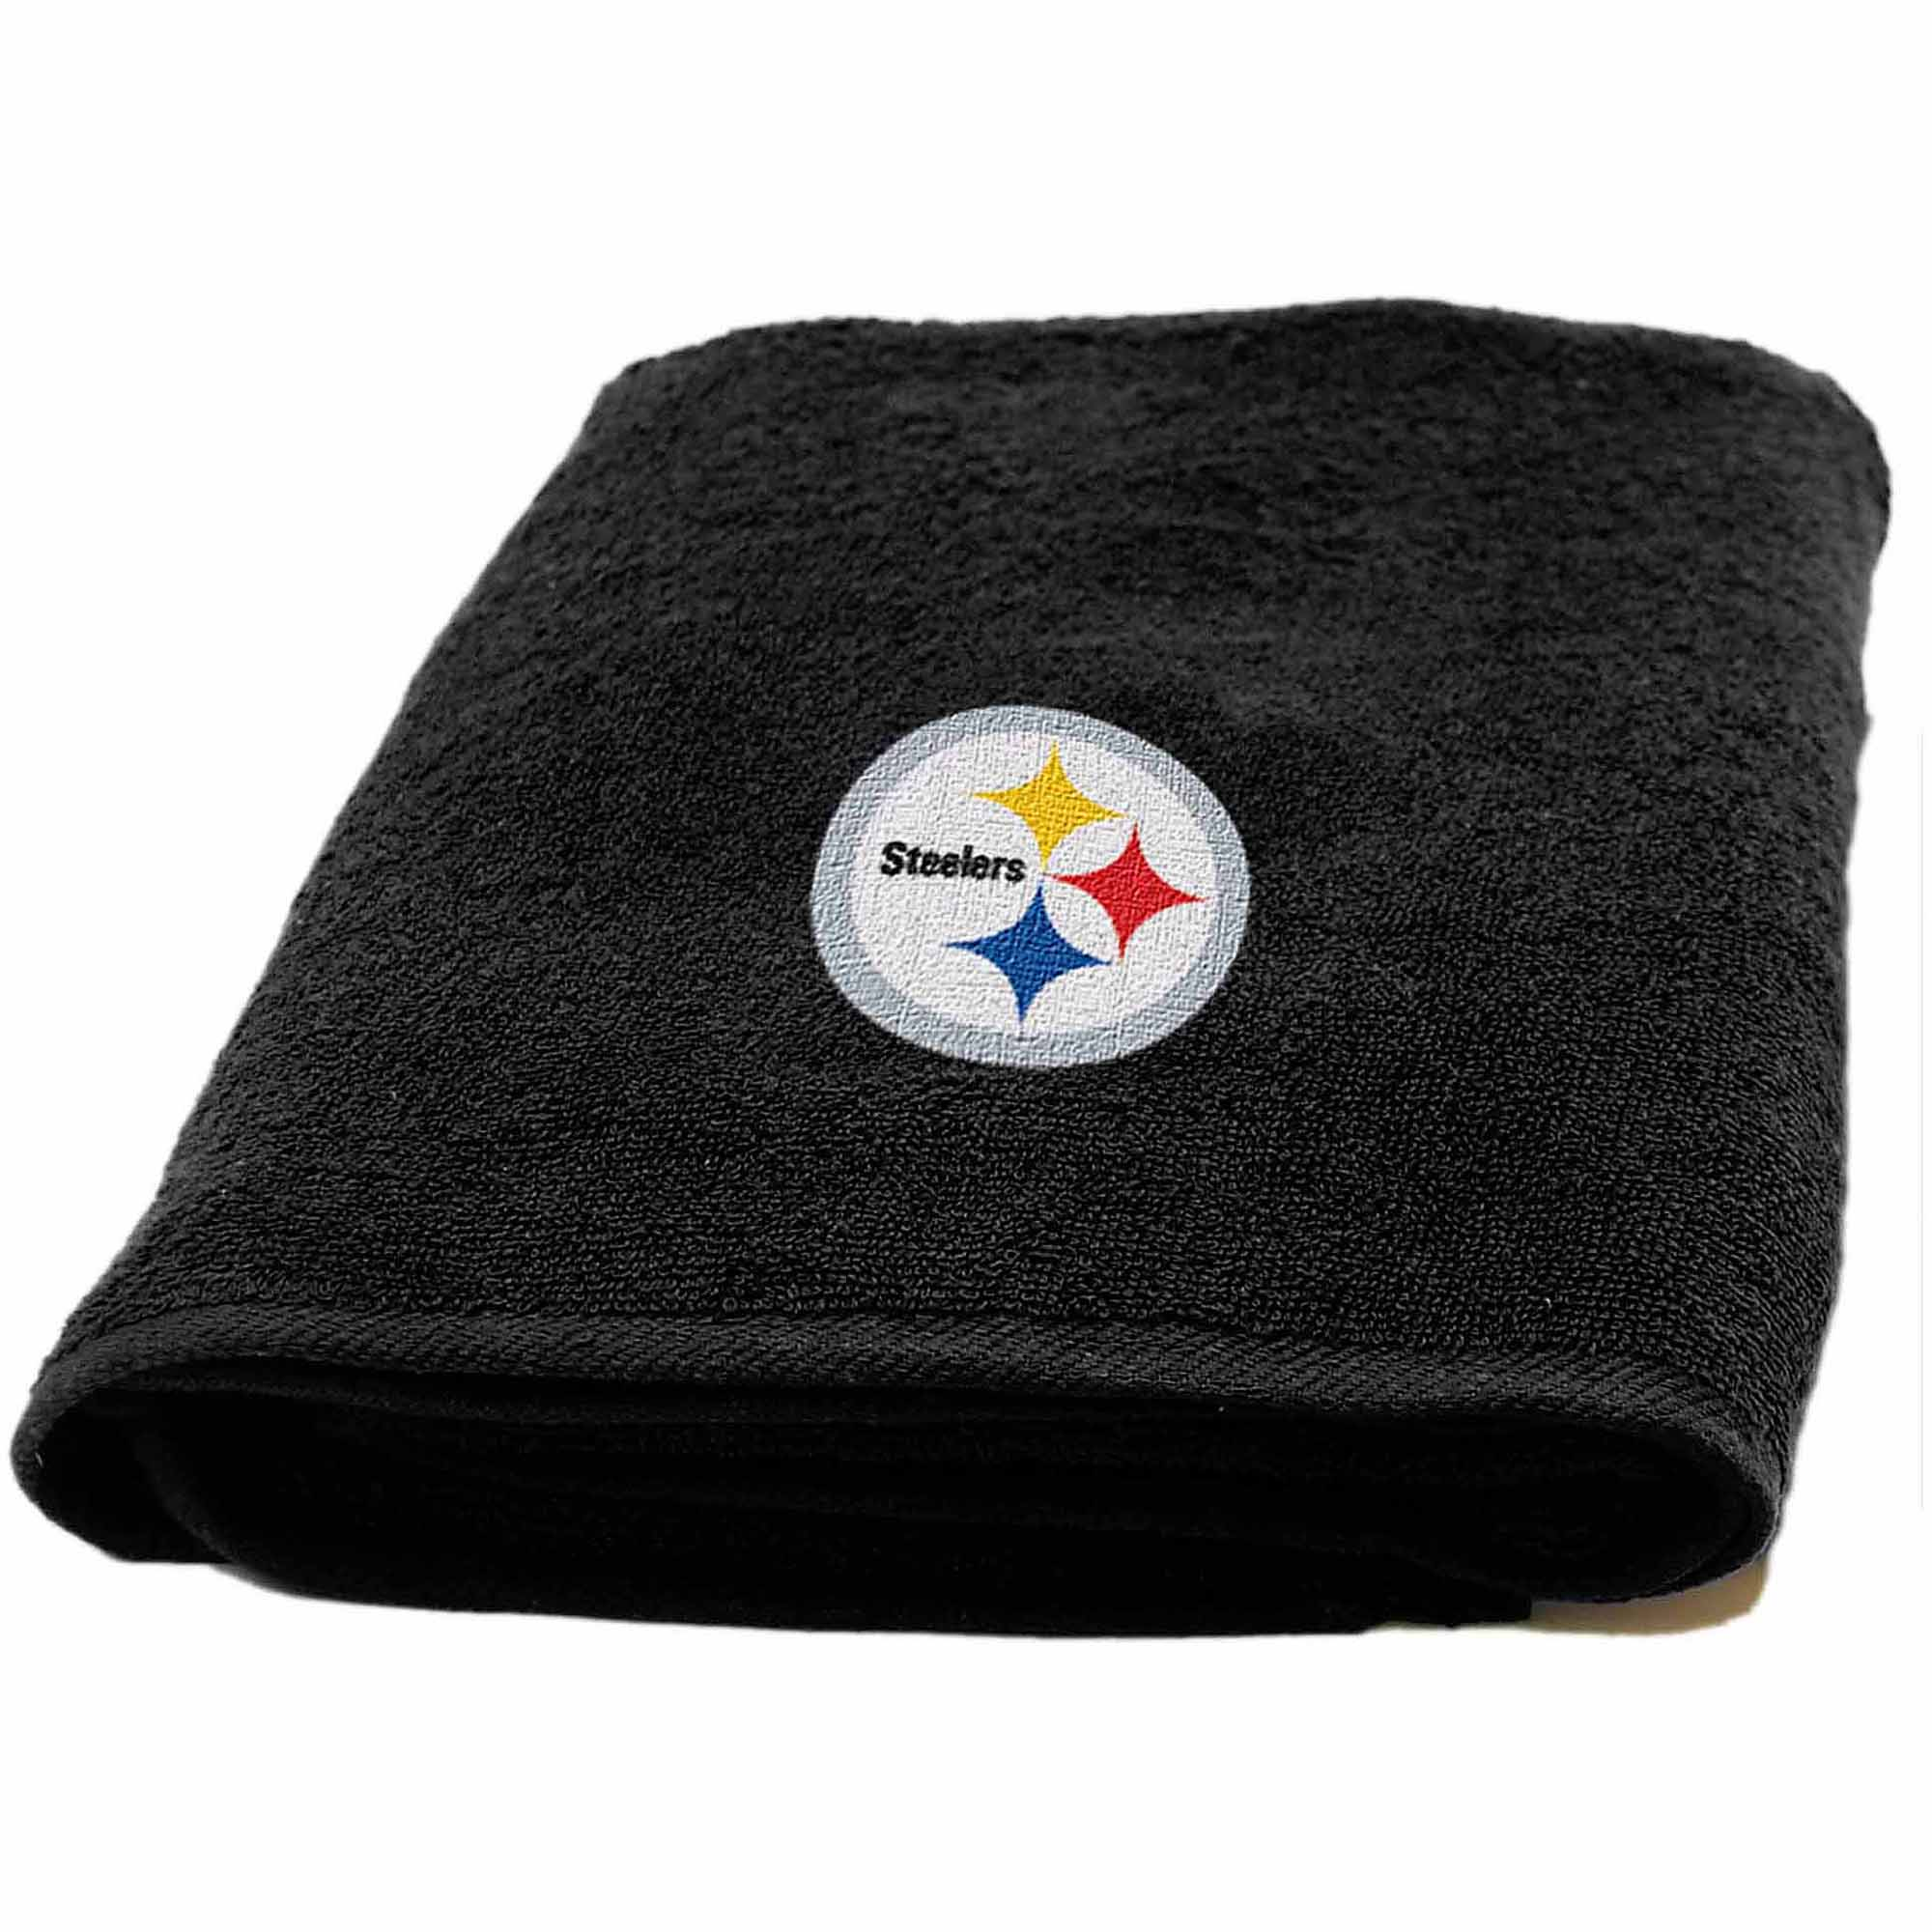 NFL Pittsburgh Steelers Decorative Bath Collection - Bath Towel